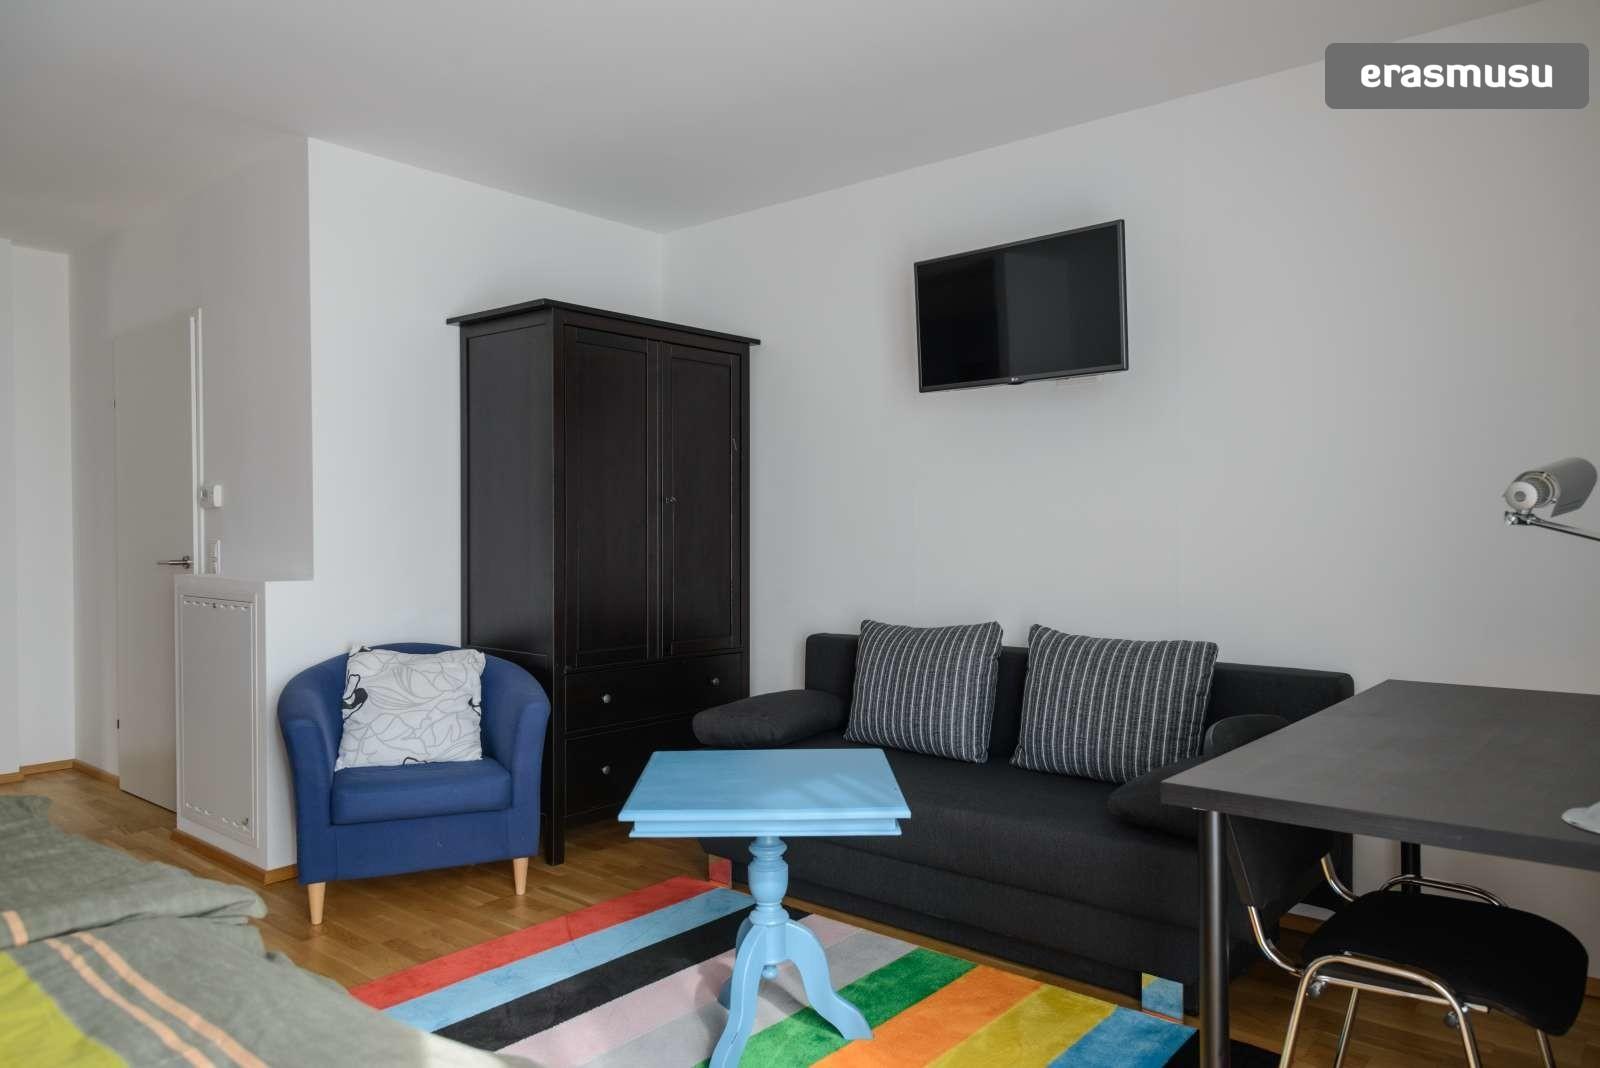 spacious-studio-apartment-rent-aspern-area-donaustadt-18e5995e69